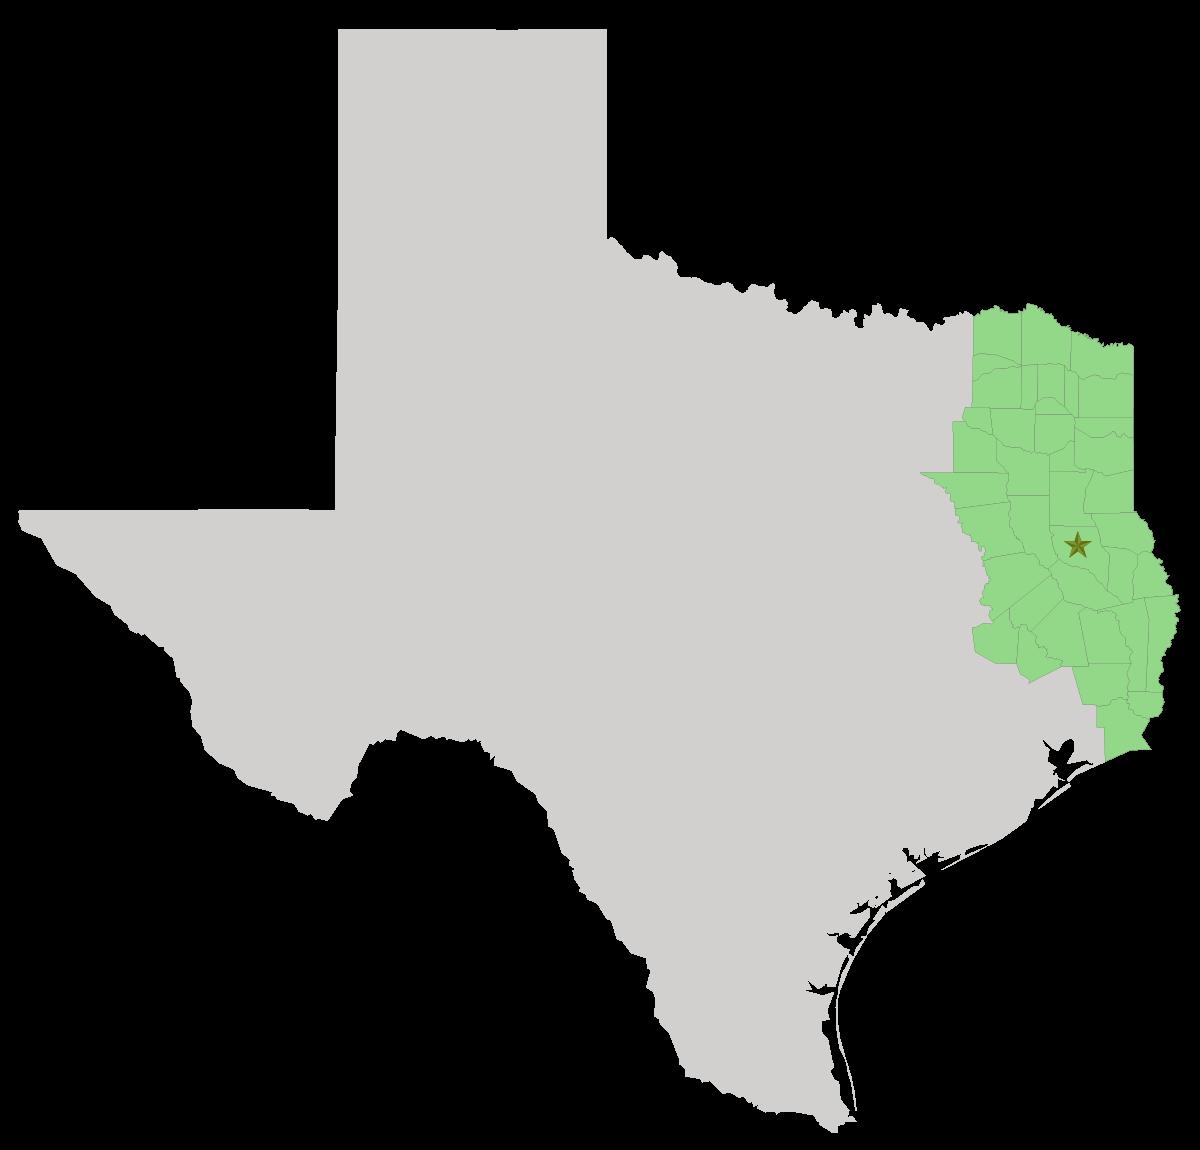 Map of where to find the best arbitrator or mediator in east texas, beaumont, tyler, longview, port arthur, huntsville, tx